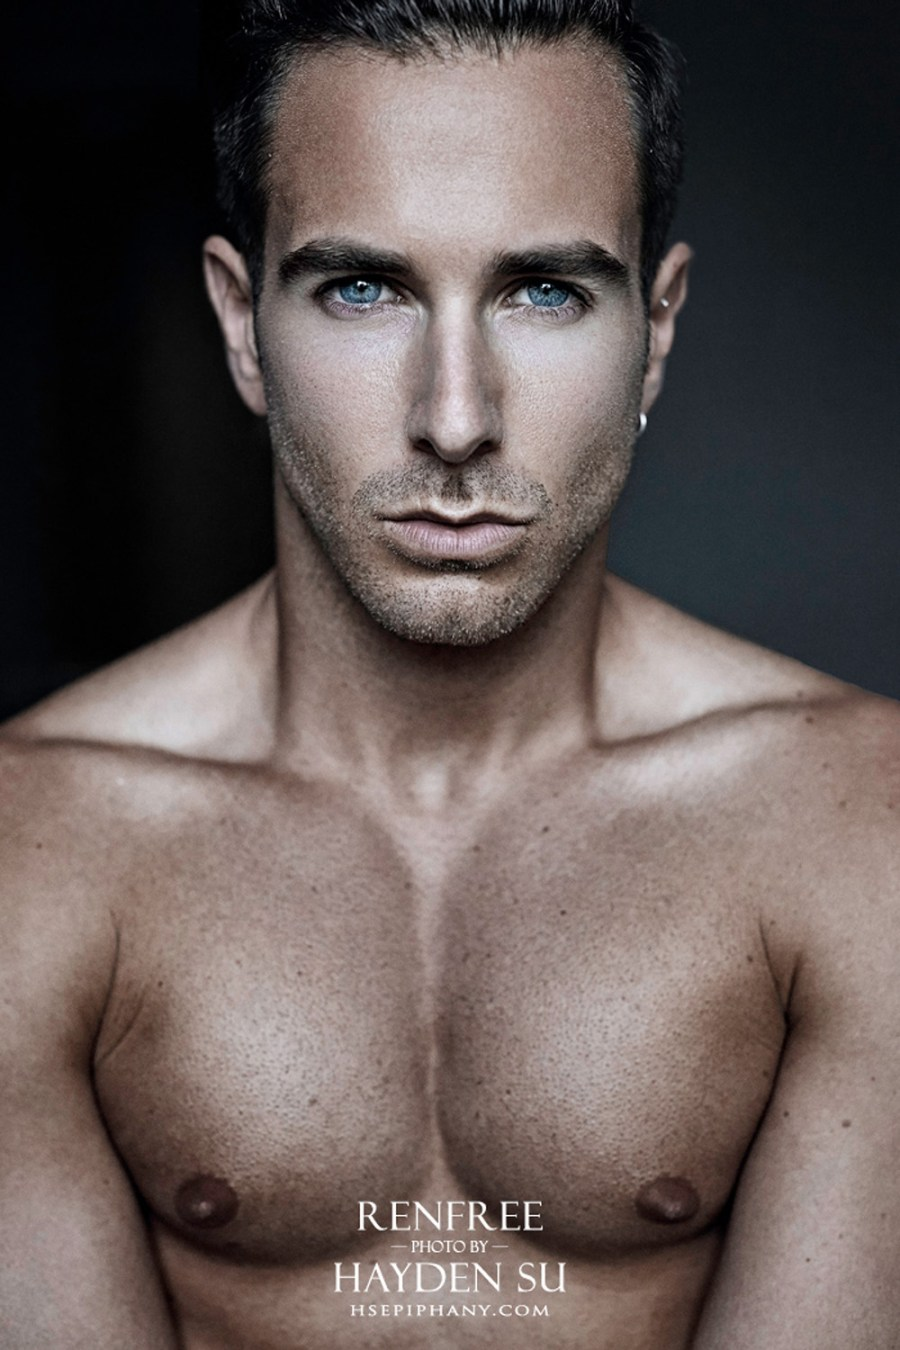 Aaron Renfree by Hayden Su for Fashionably Male